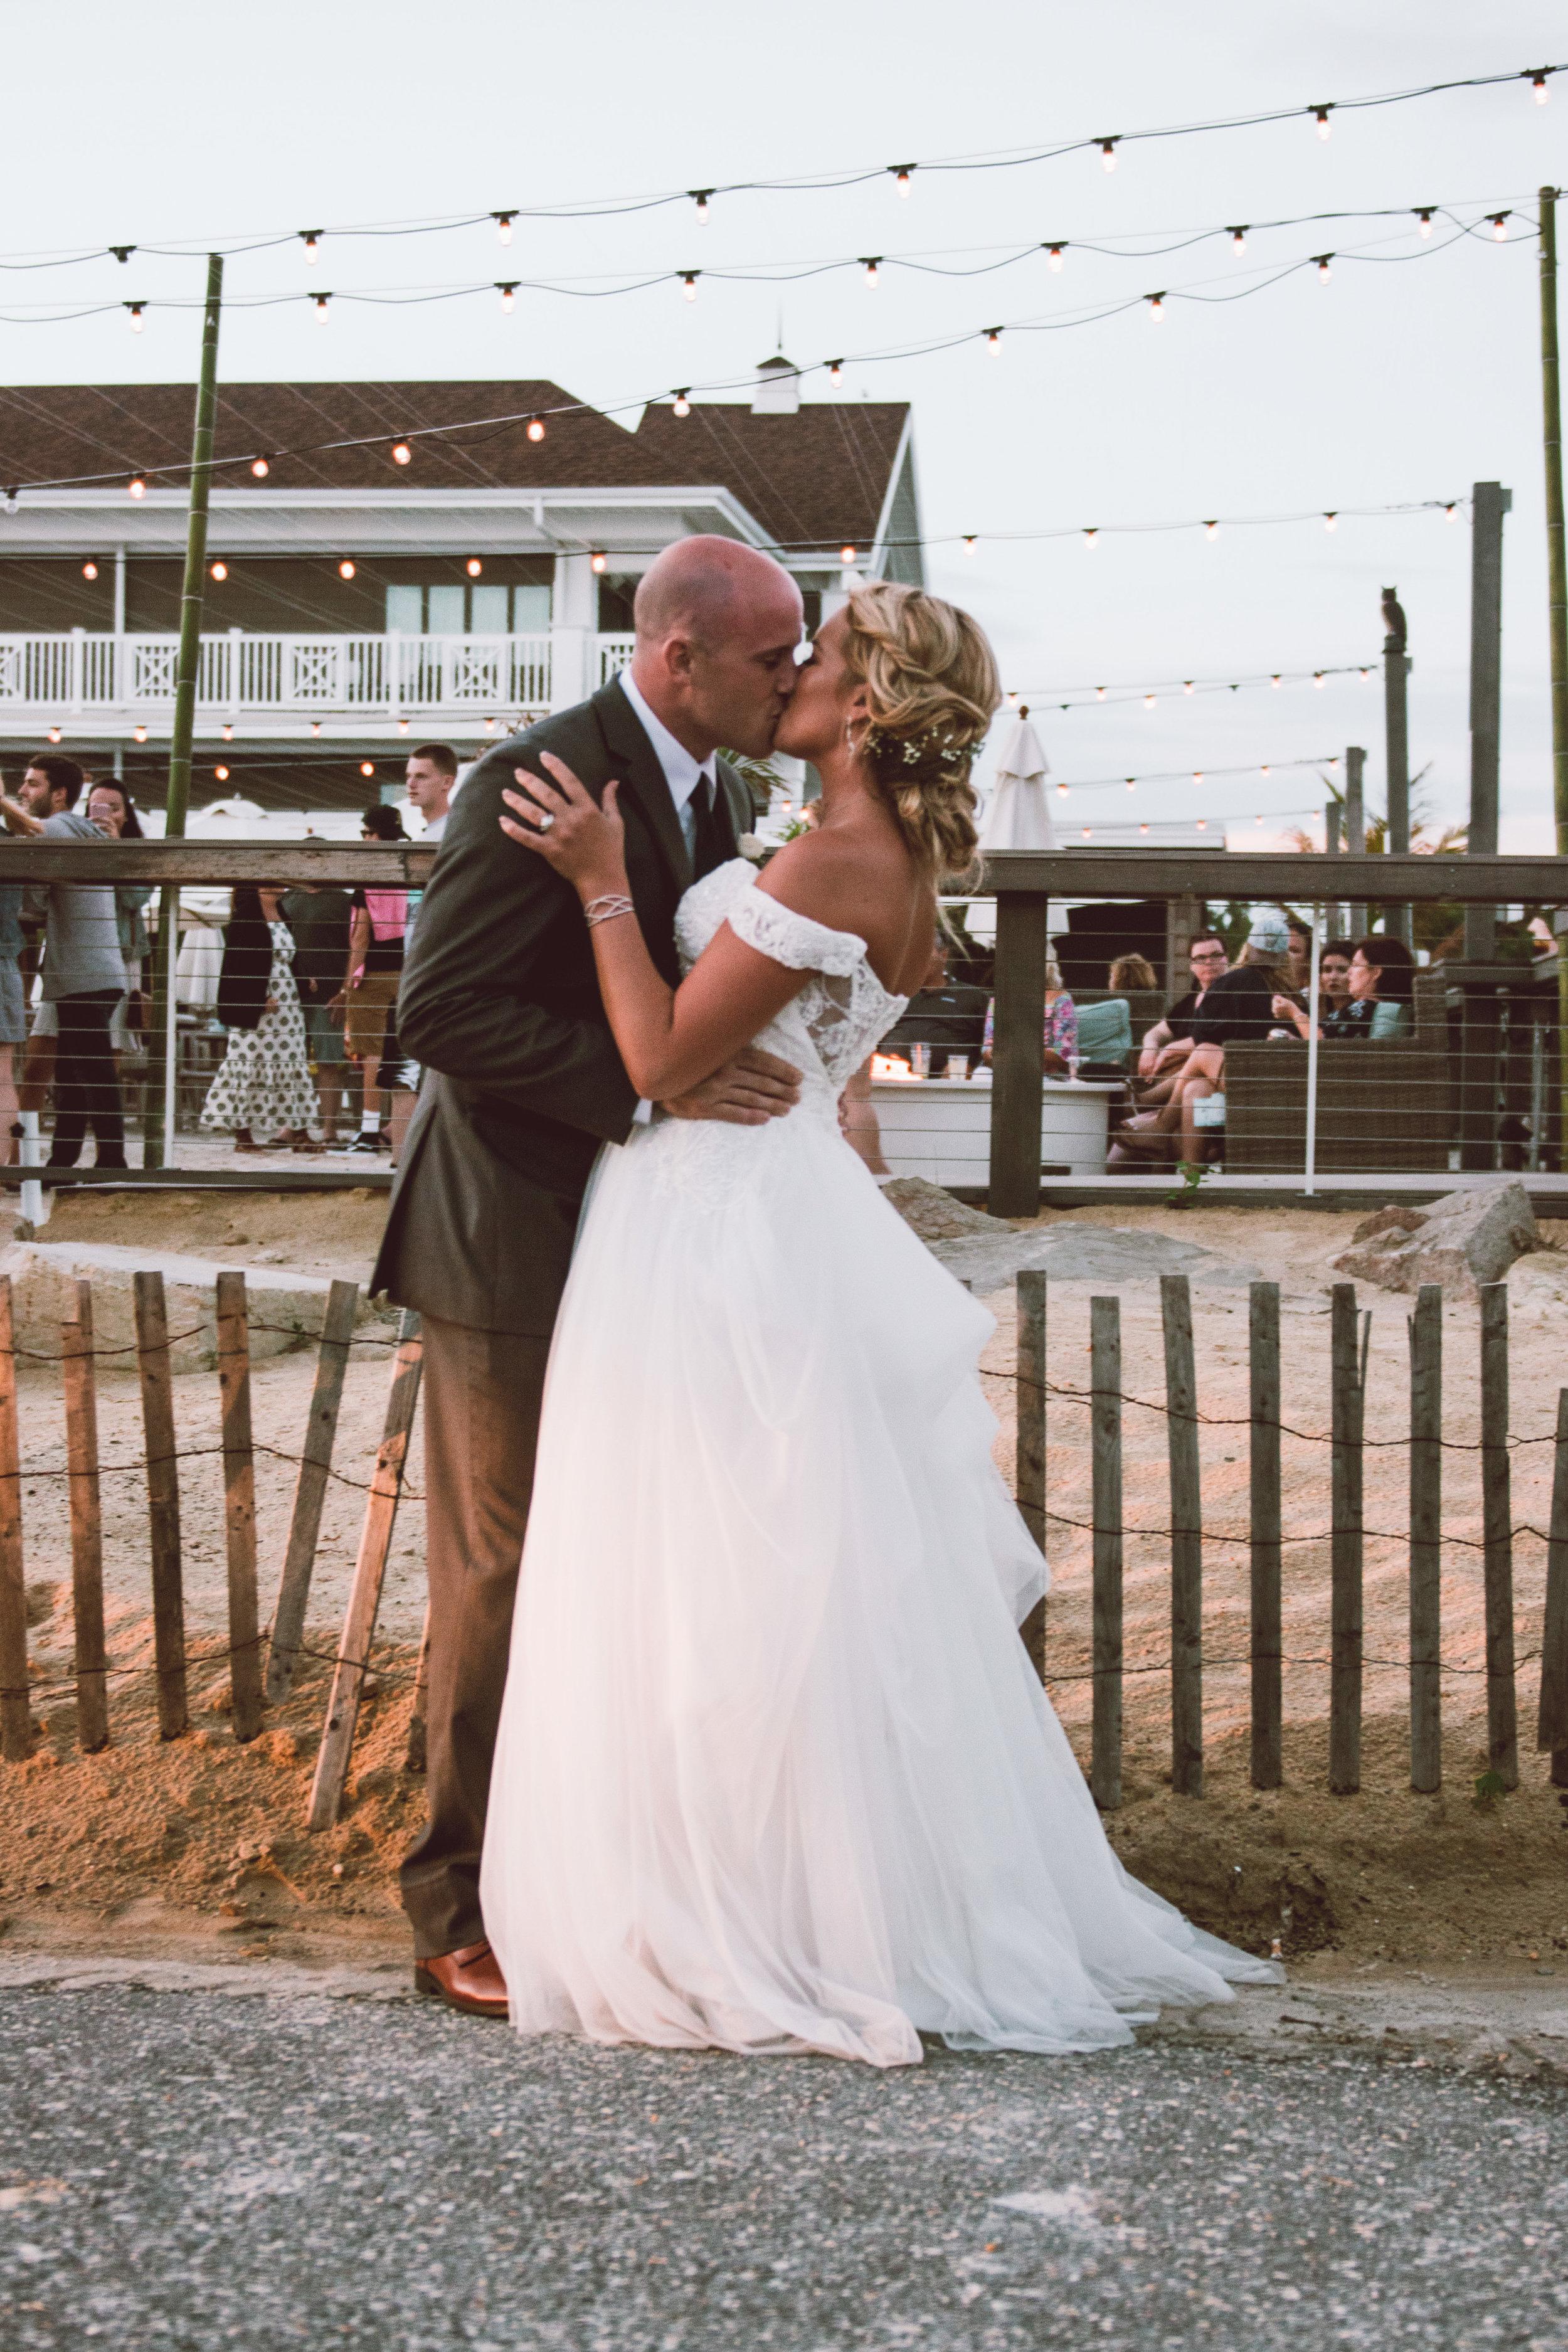 ICONA GOLDEN INN AVALON NJ WEDDING PHOTOGRAPHY  - 081.jpg